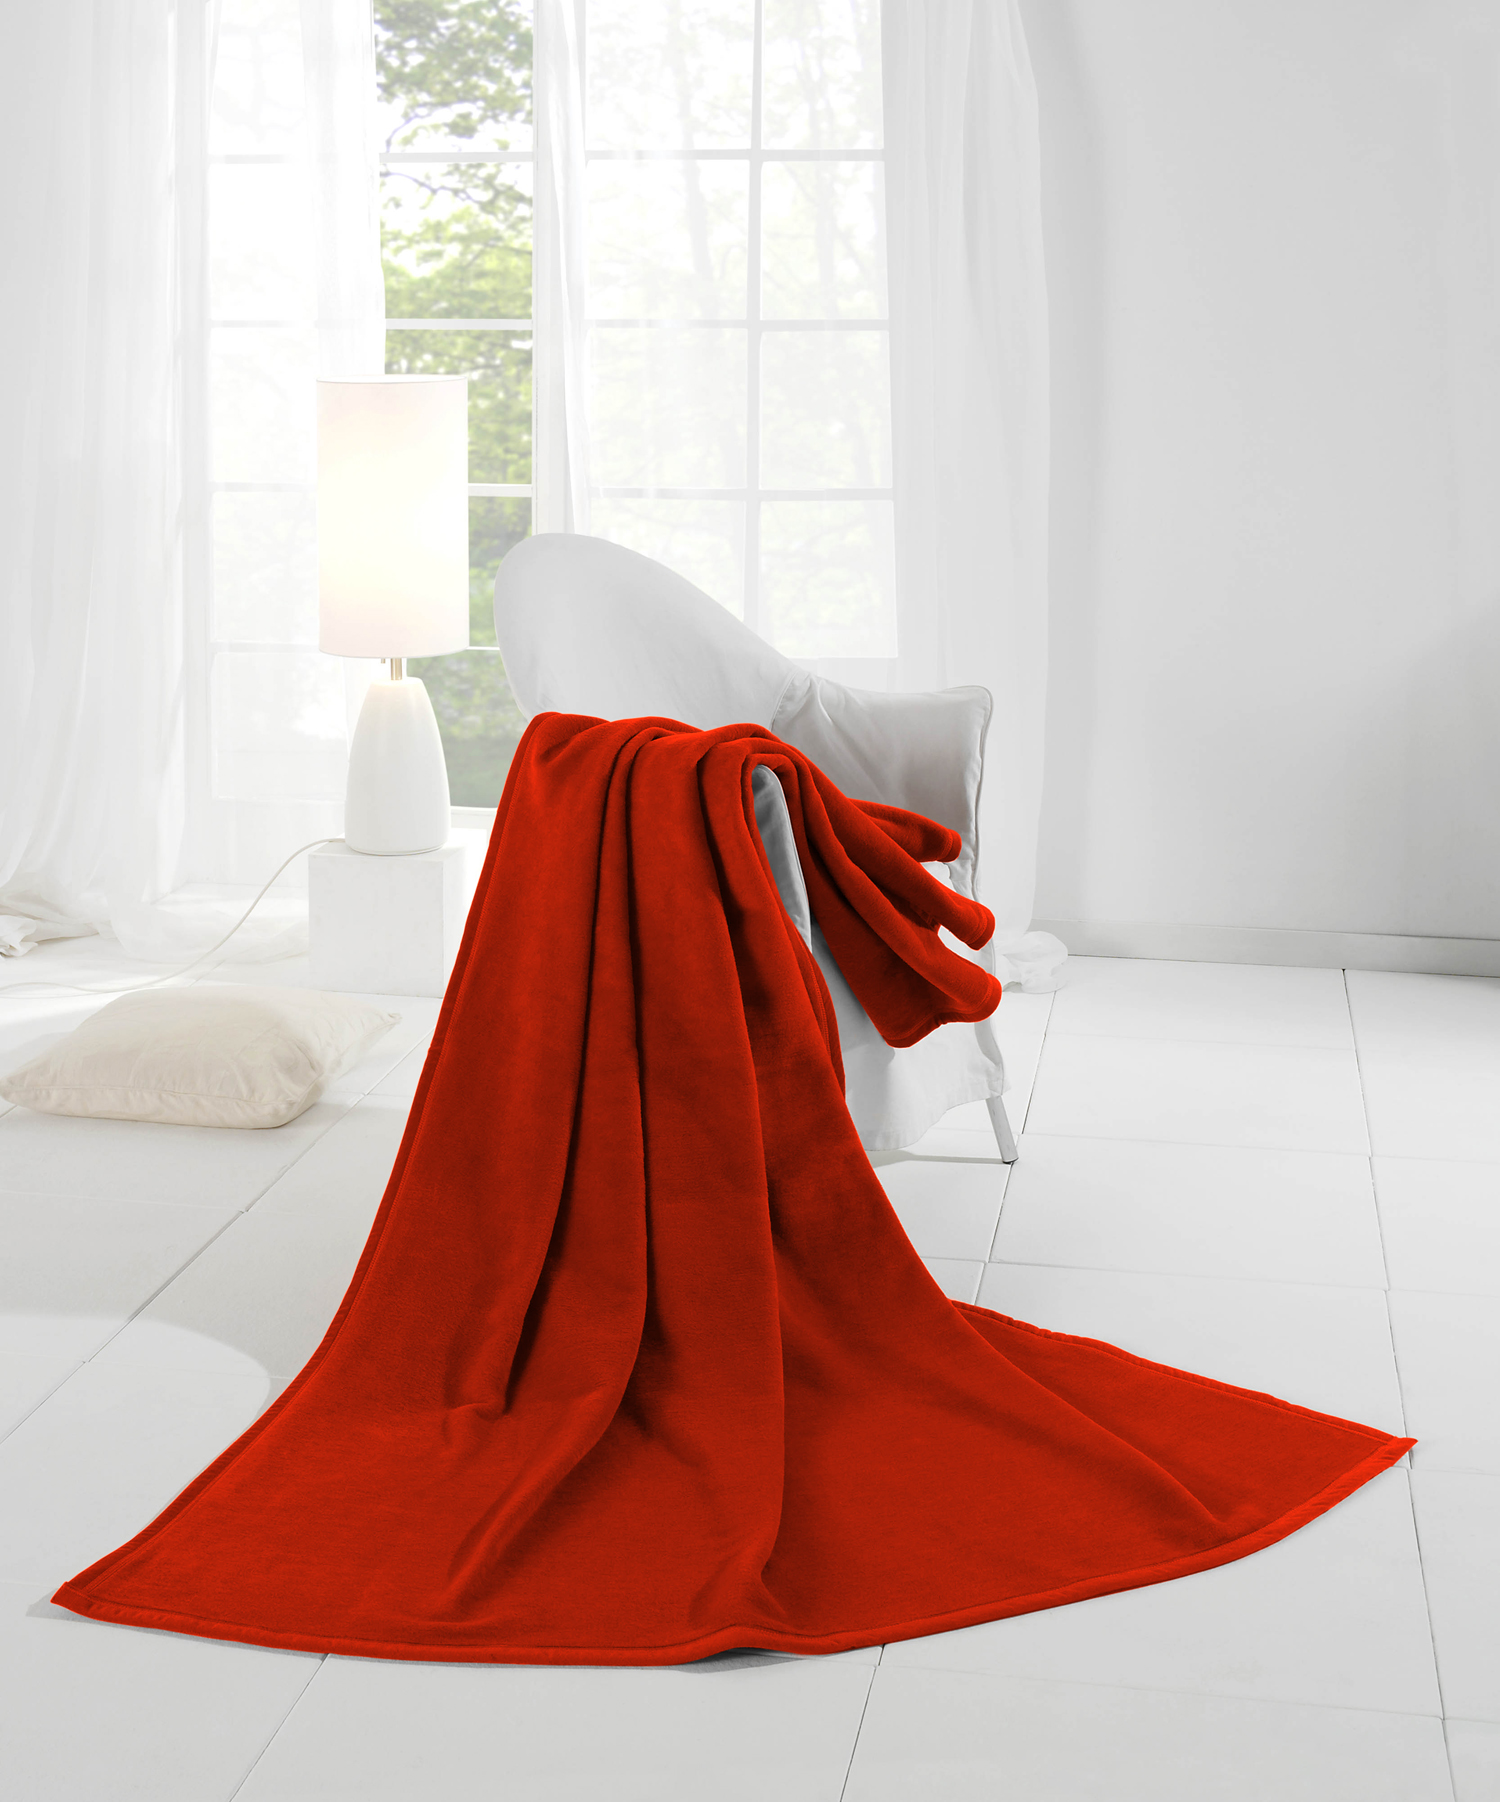 Fango Decken Orion Cotton 180 x 220 cm